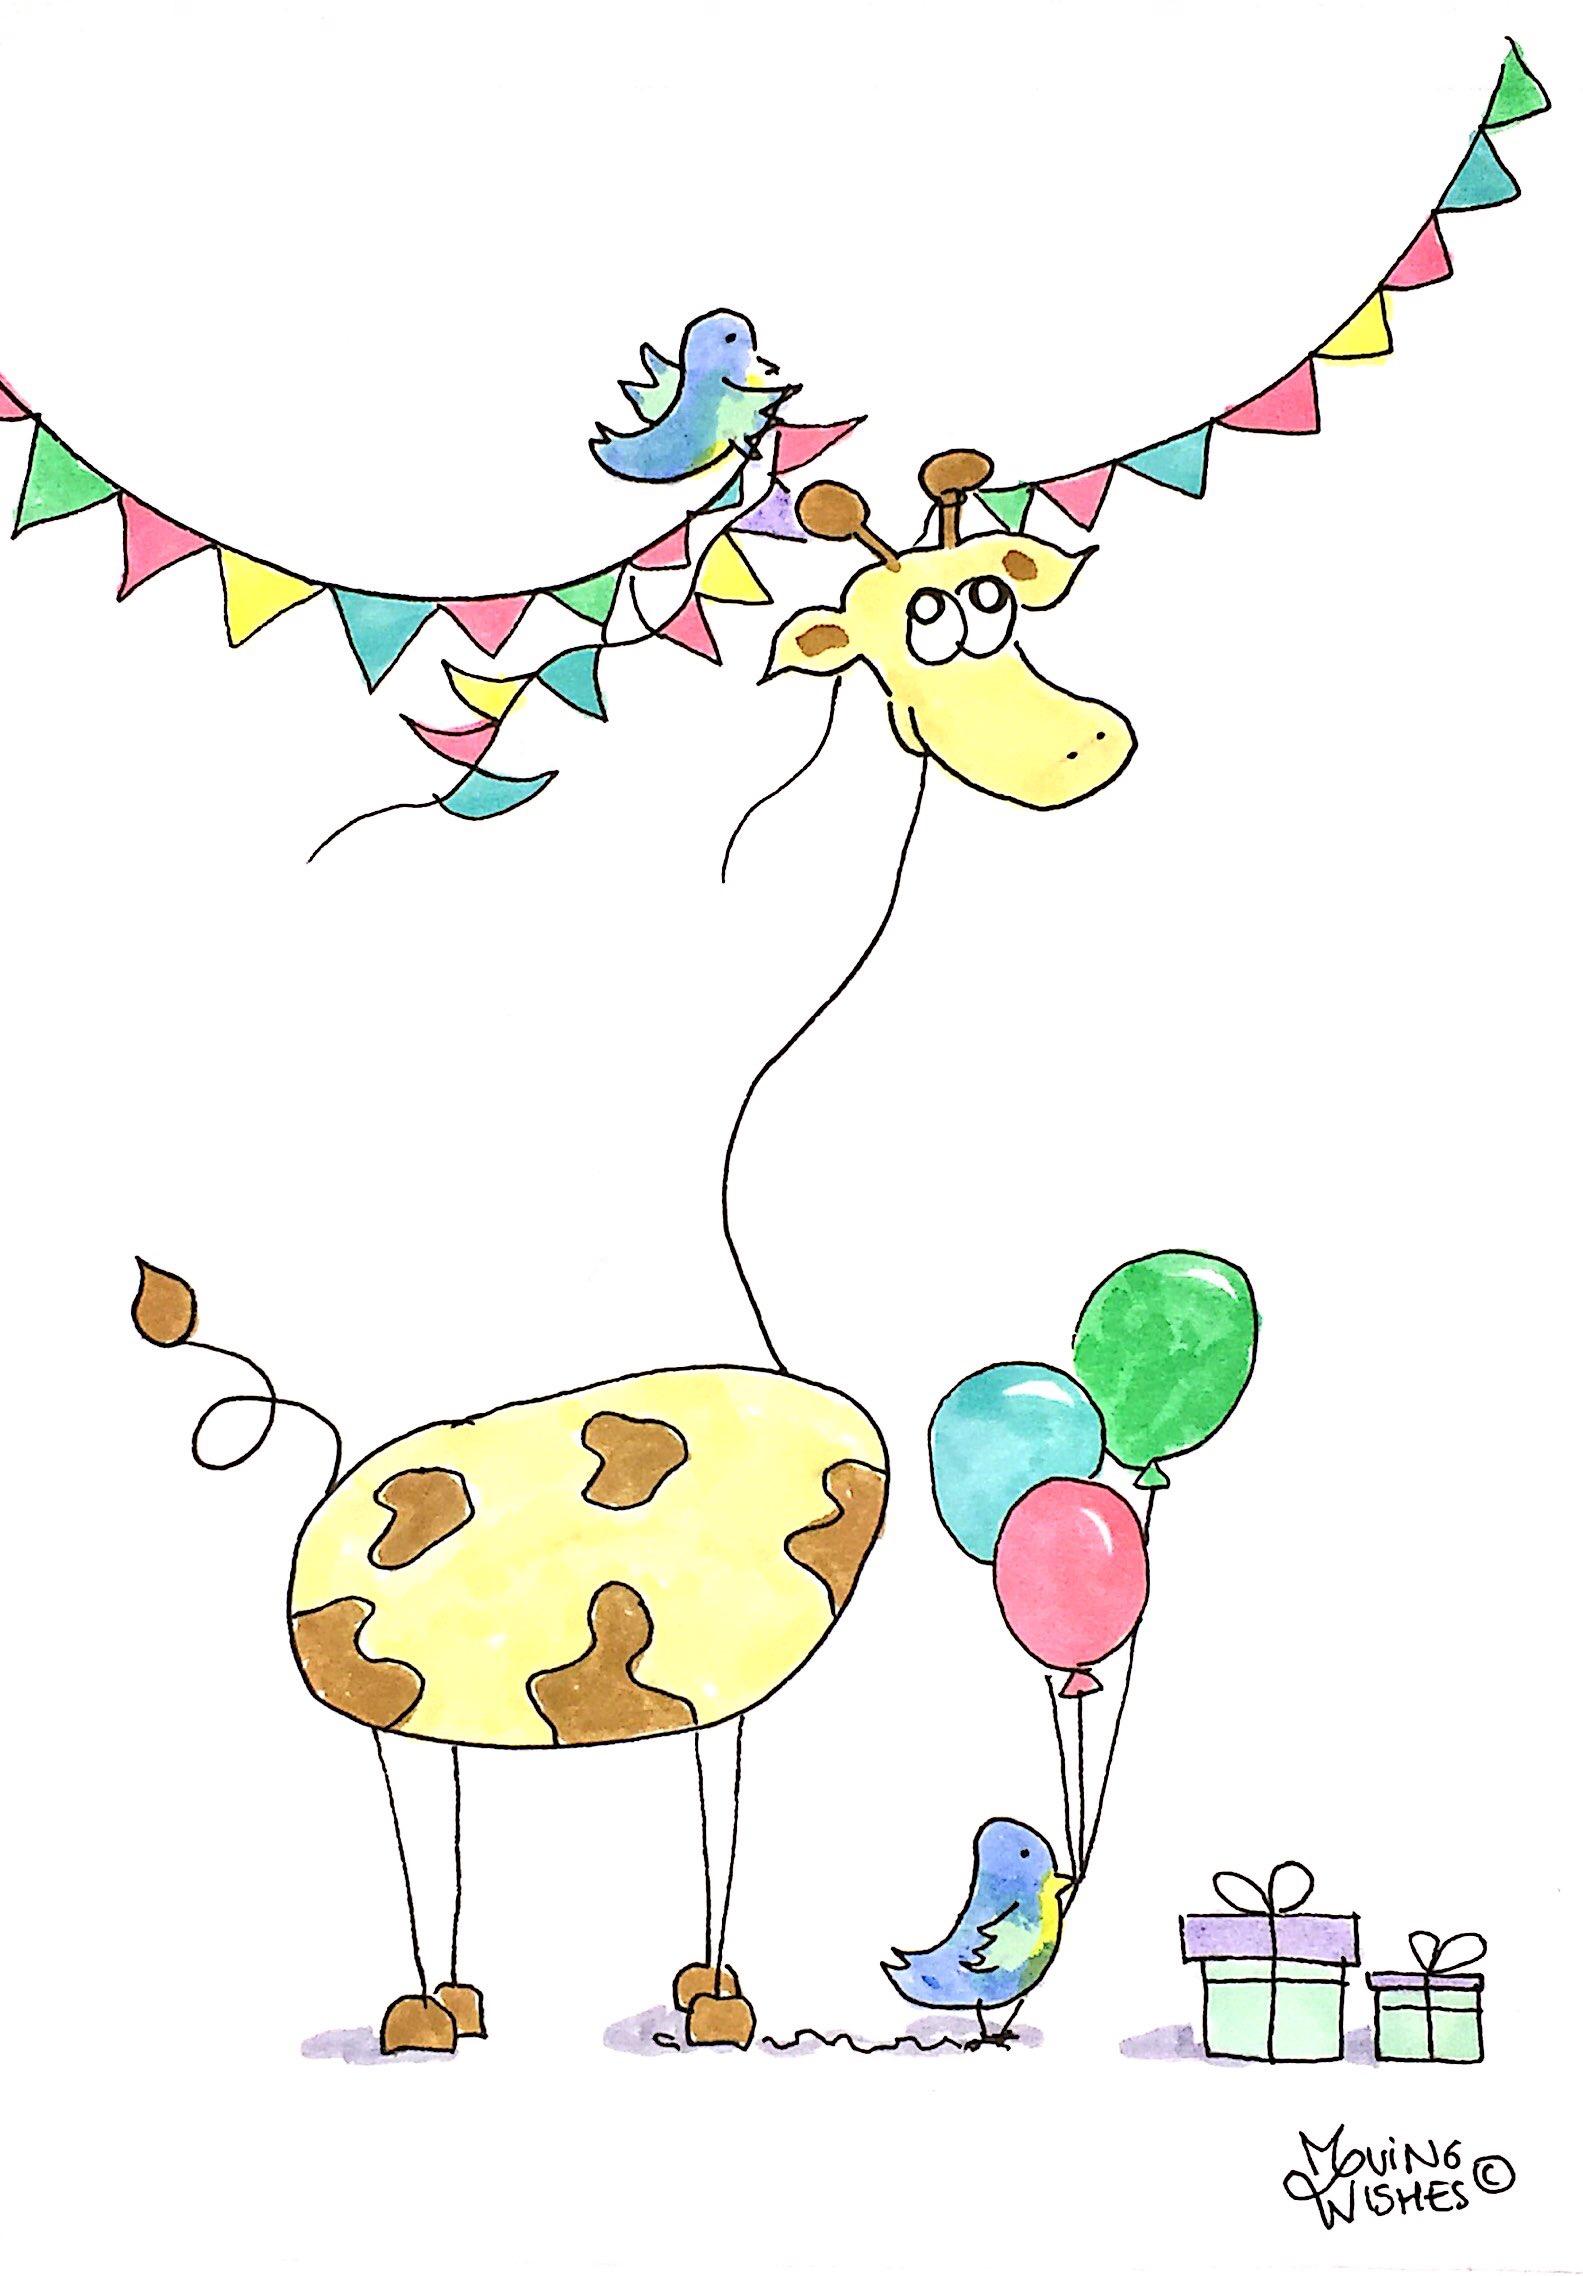 Verjaardagskaart giraffe, vogel en slinger